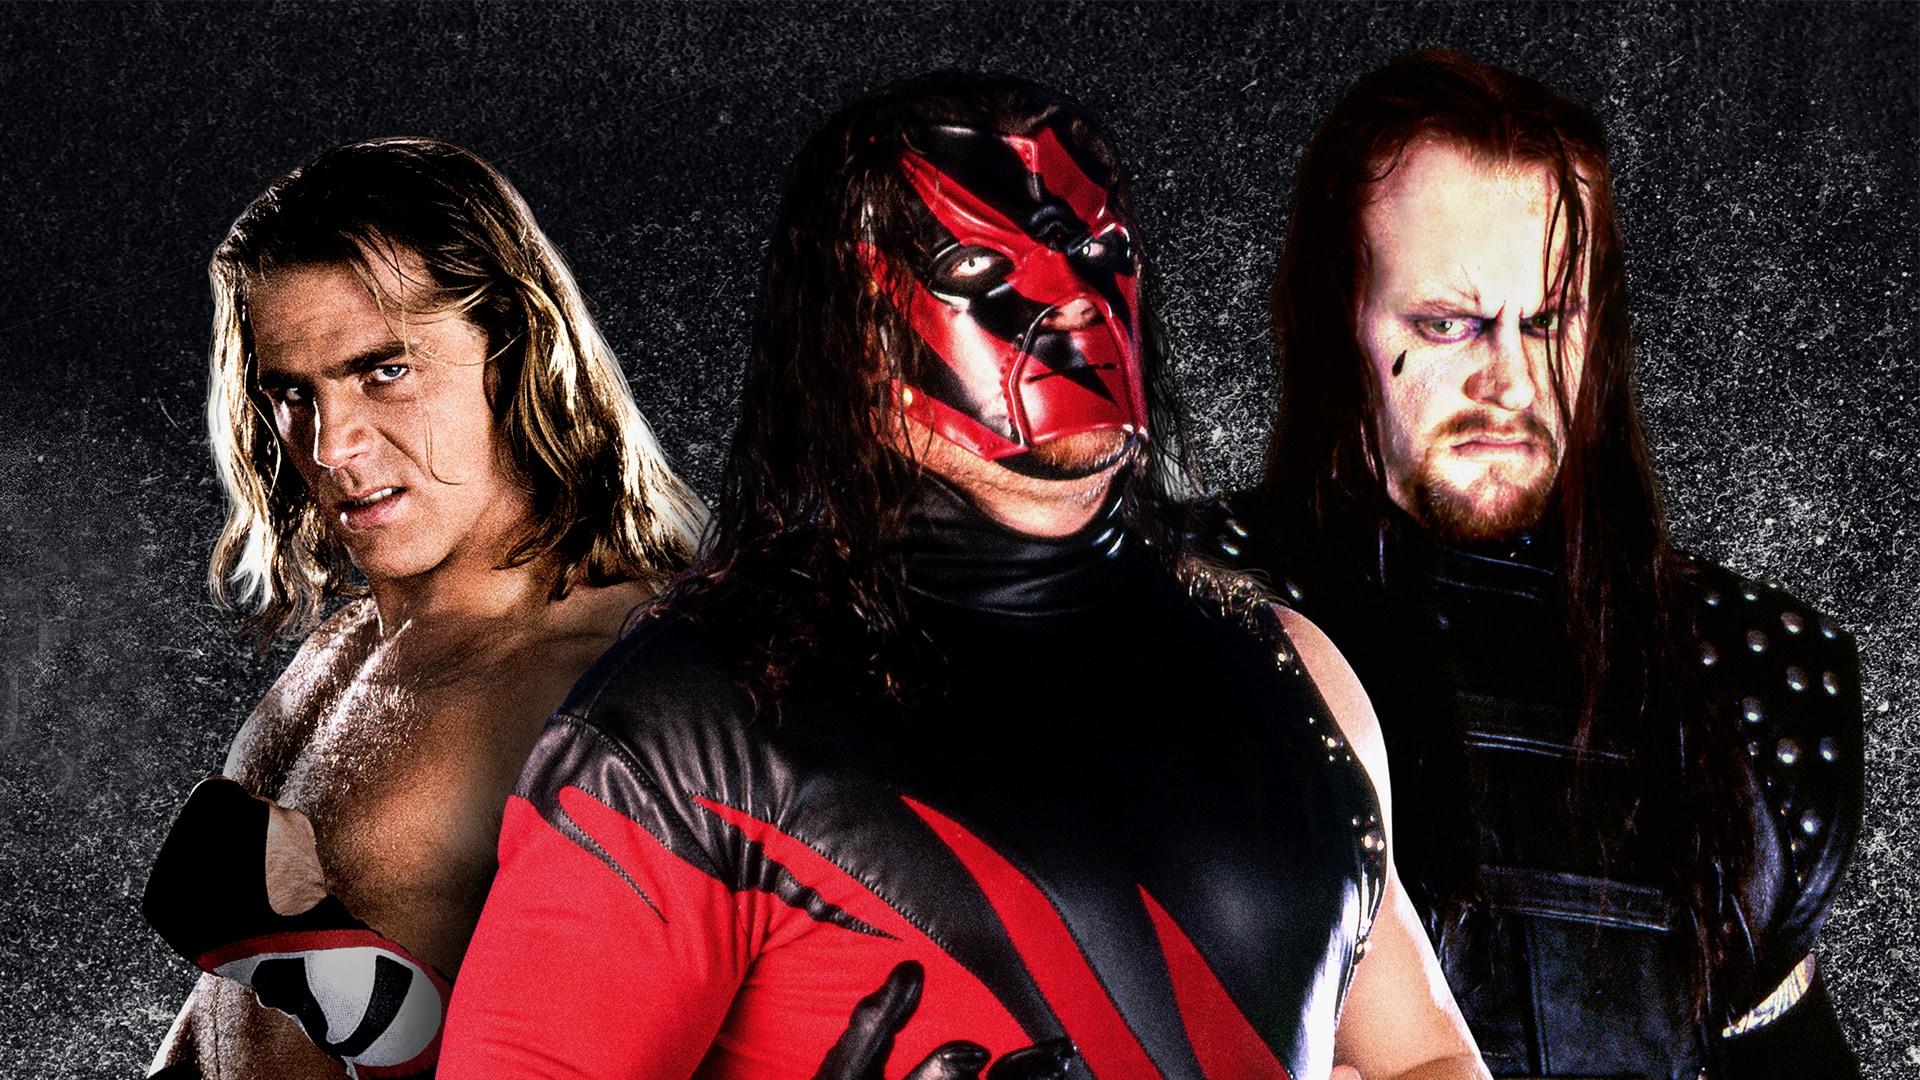 That's Gotta Be Kane!